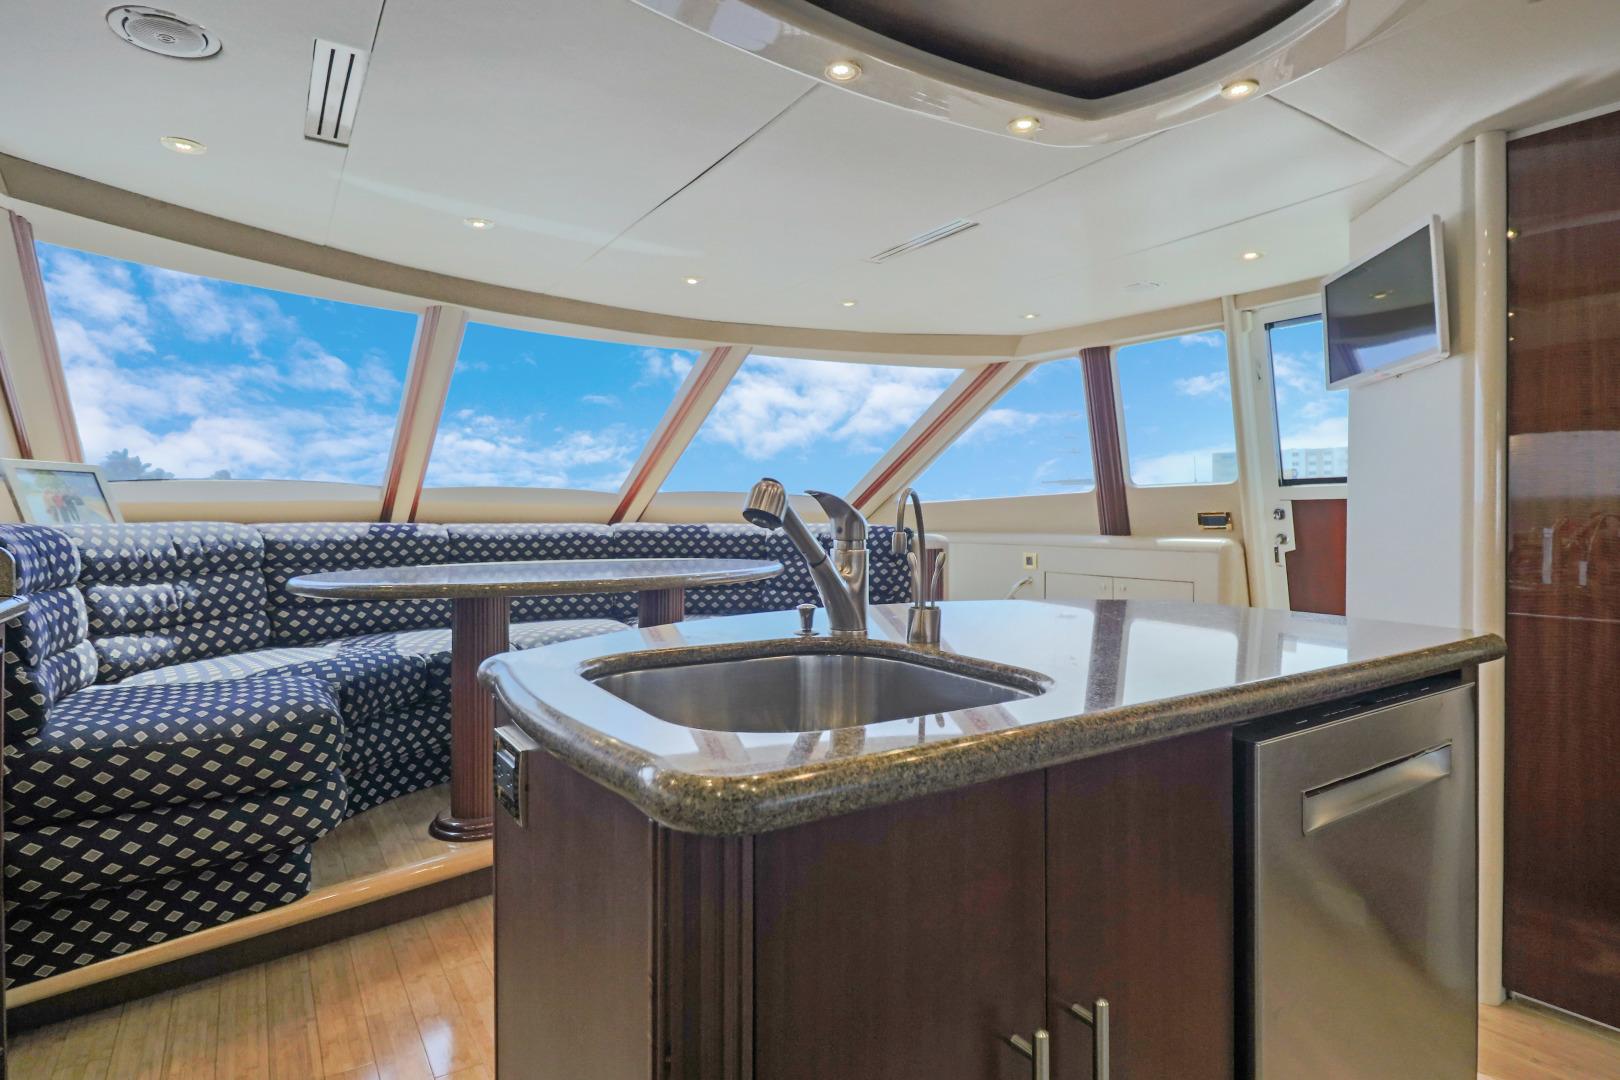 Lazzara-Sky Lounge 2002-Sea Bear Florida-United States-1419750   Thumbnail